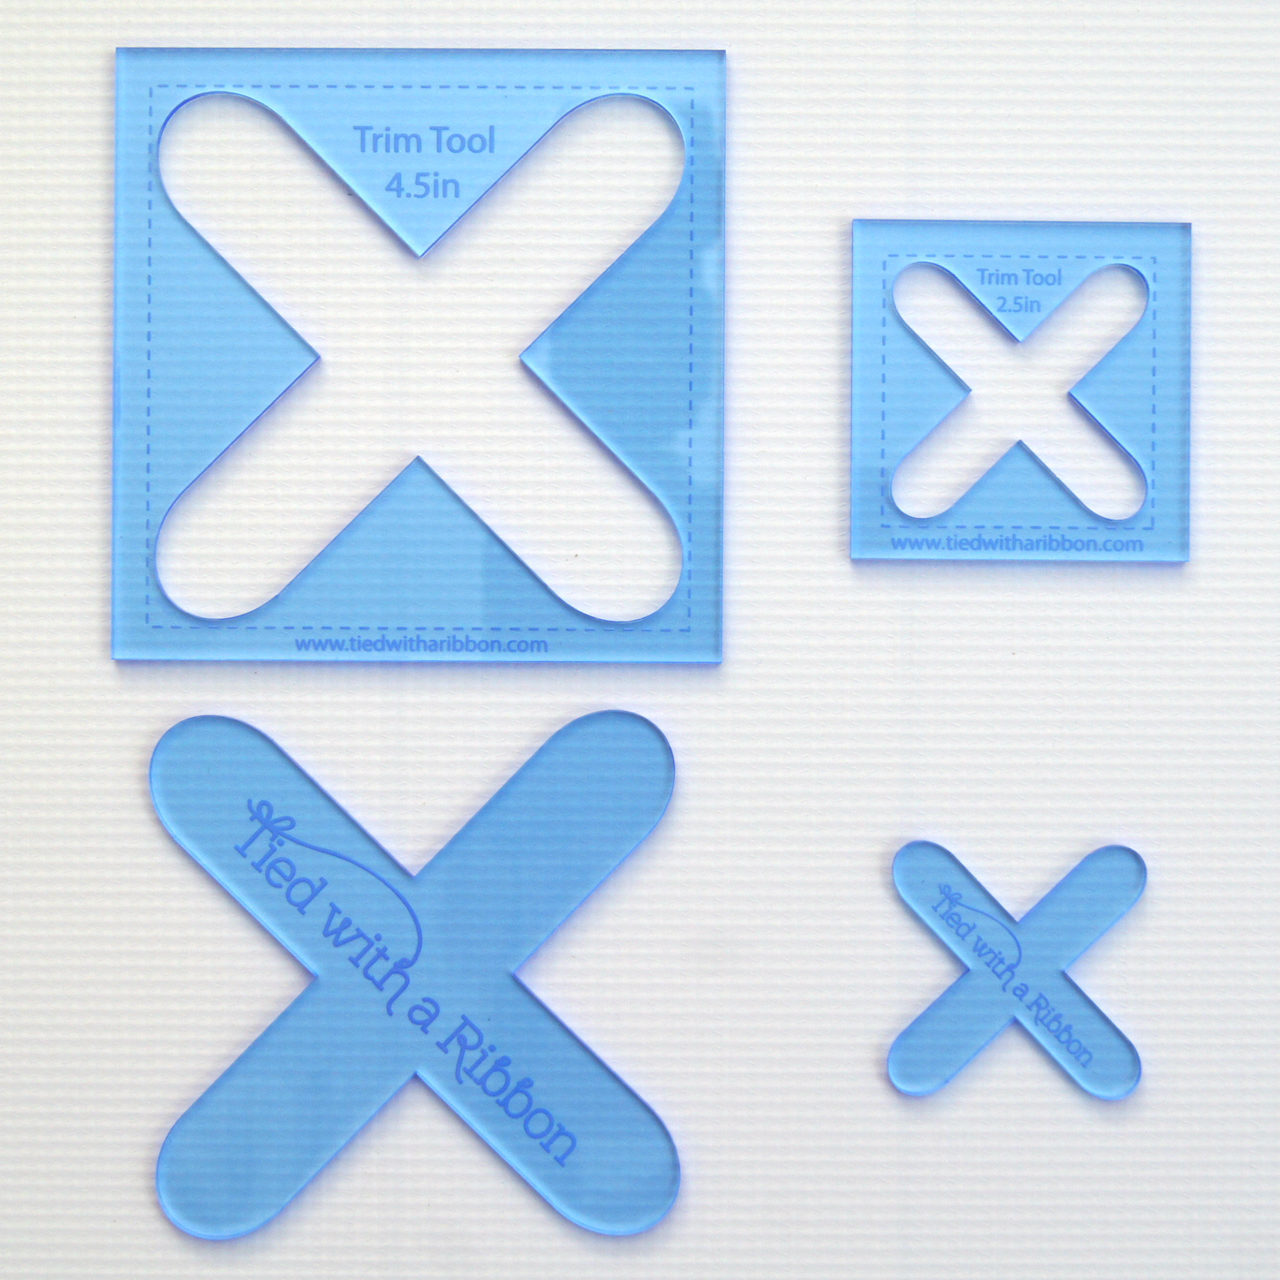 Cross-Stitch Appliqué Templates and Trim Tool Set